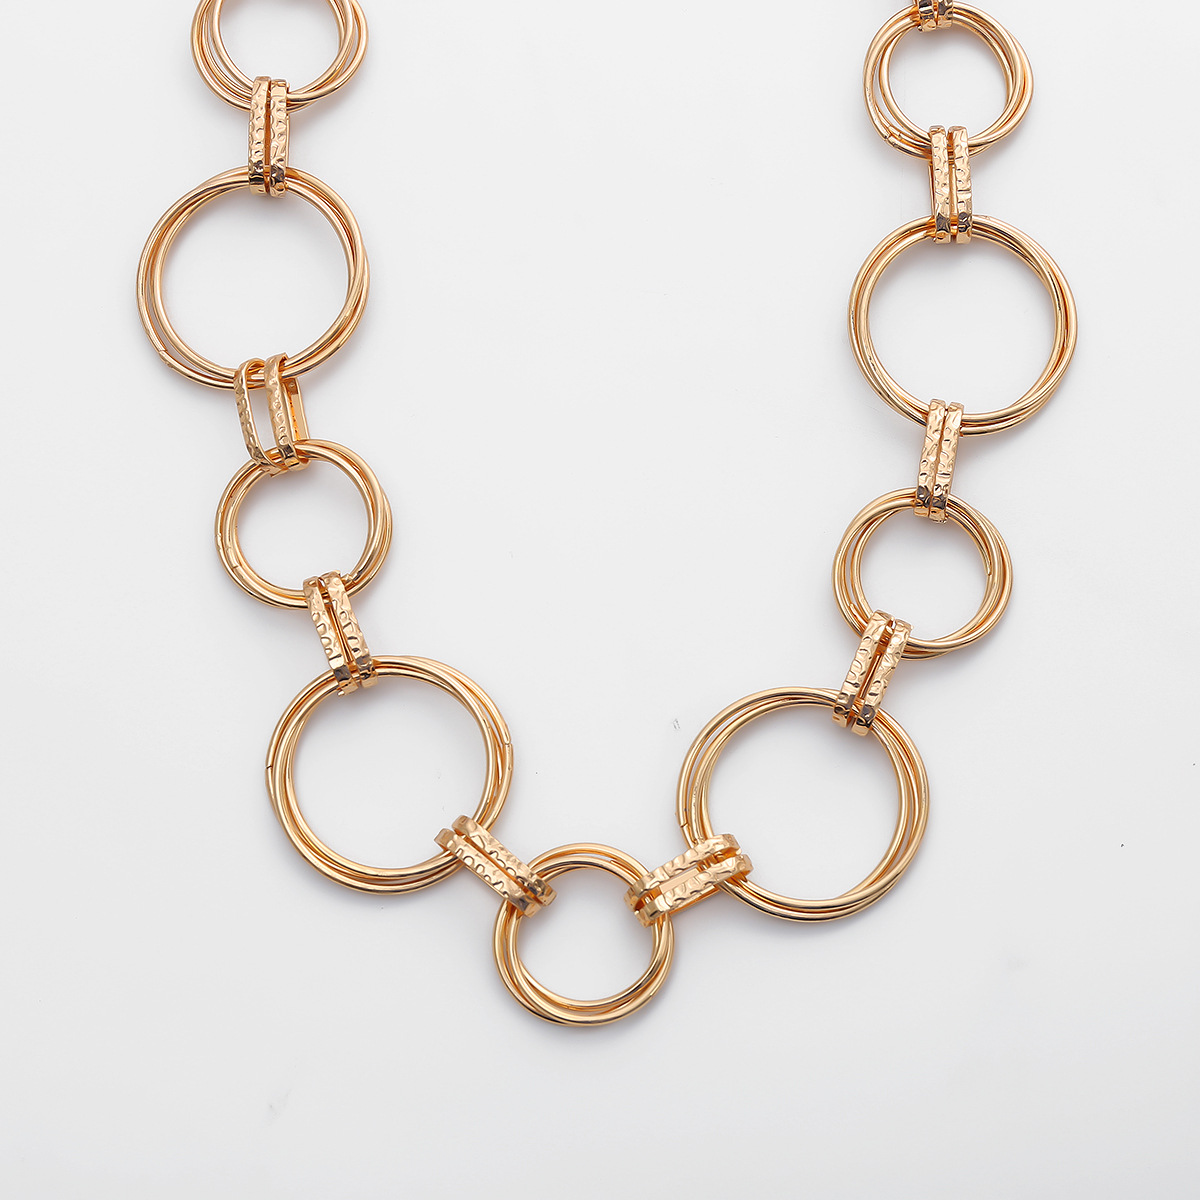 fashion jewelry sexy long tassel body chain retro multilayer ring geometric hollow waist chain wholesale nihaojewelry NHXR221297